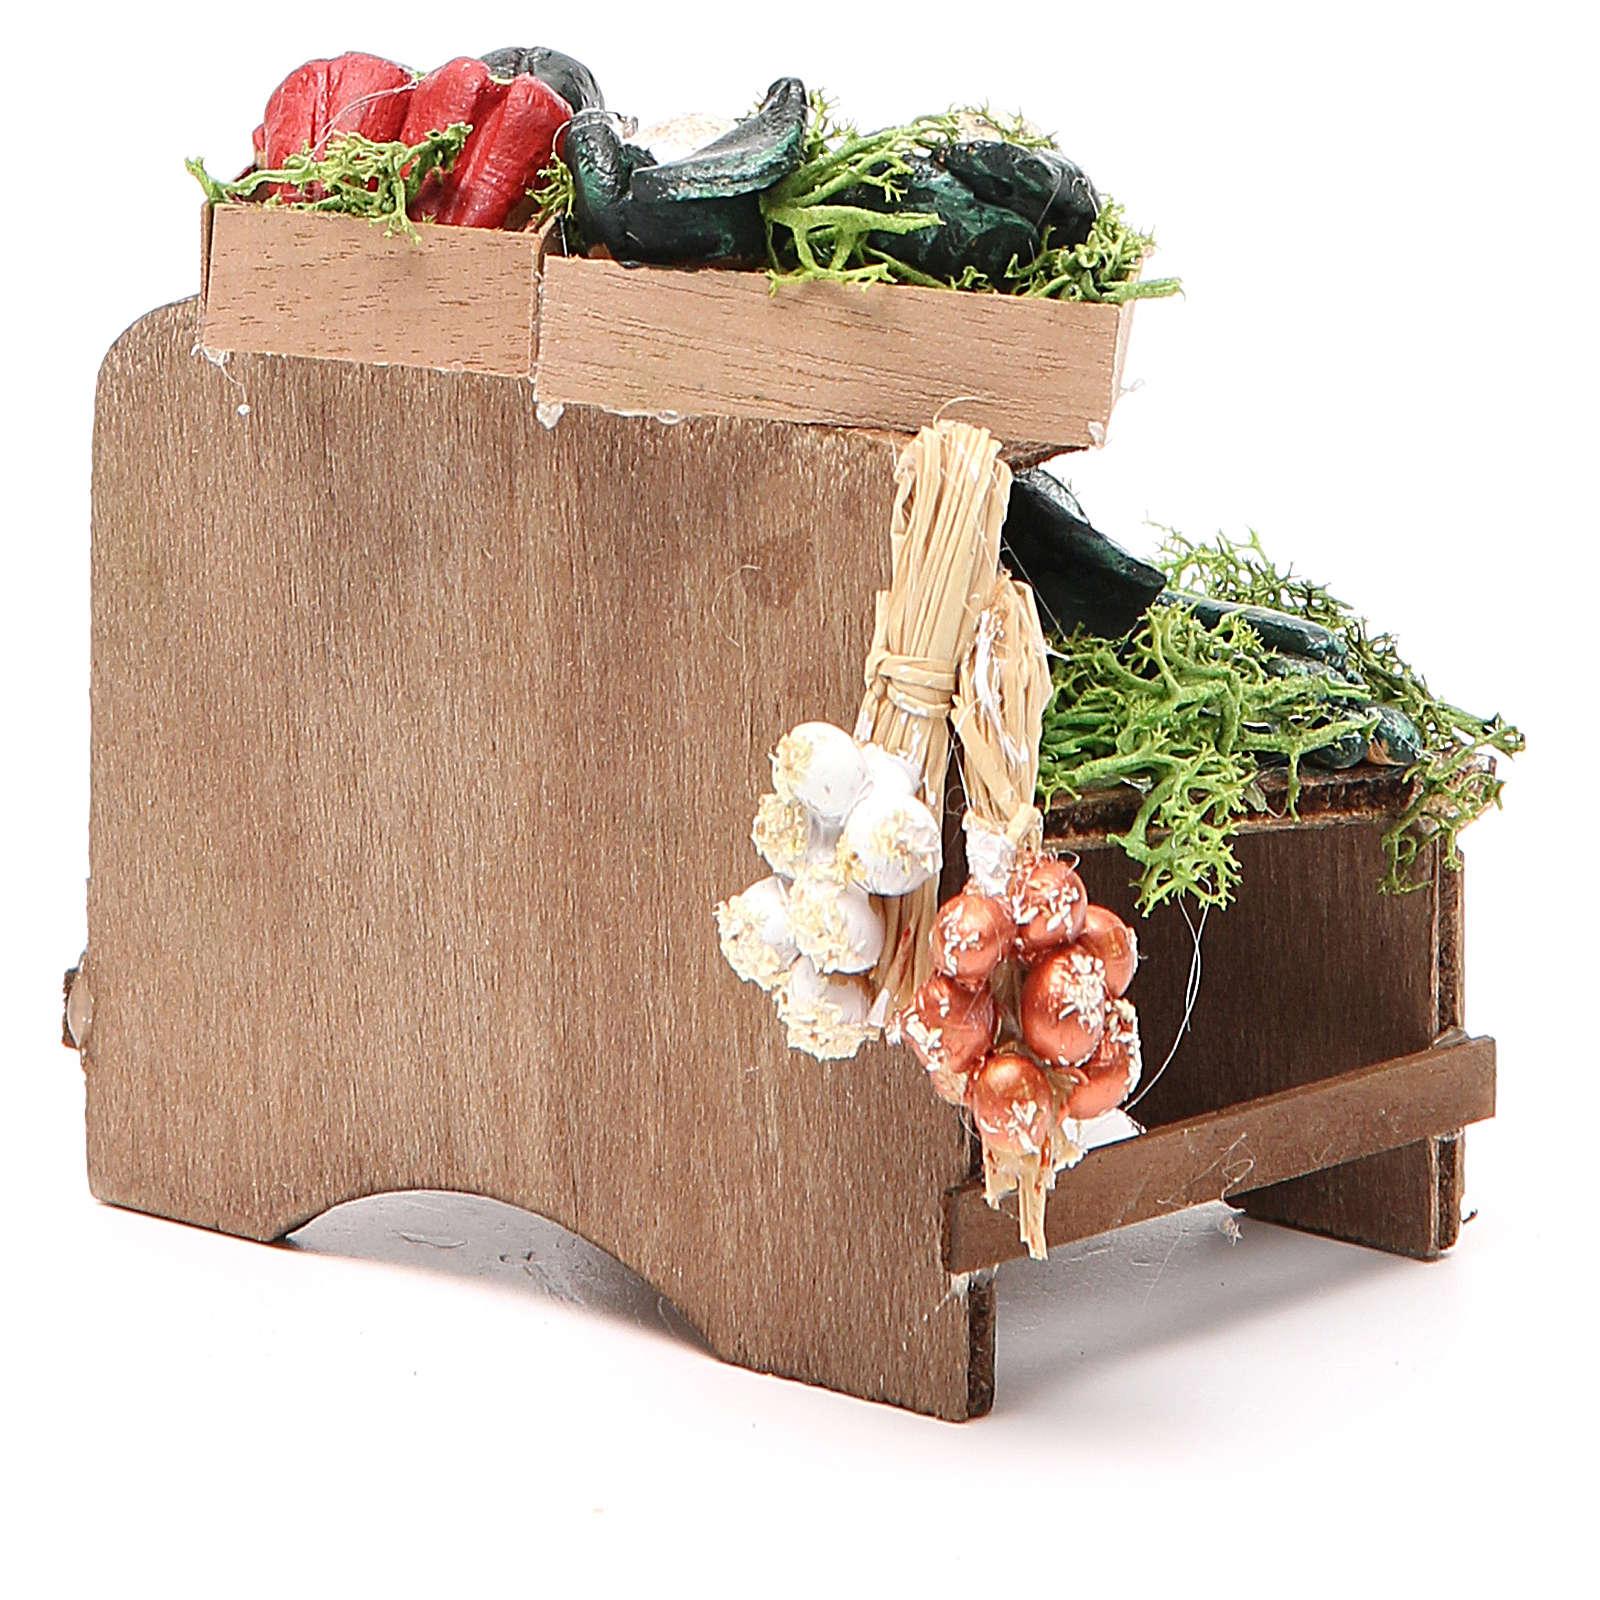 Work bench with veggies 8x9x7cm Naples Nativity 4